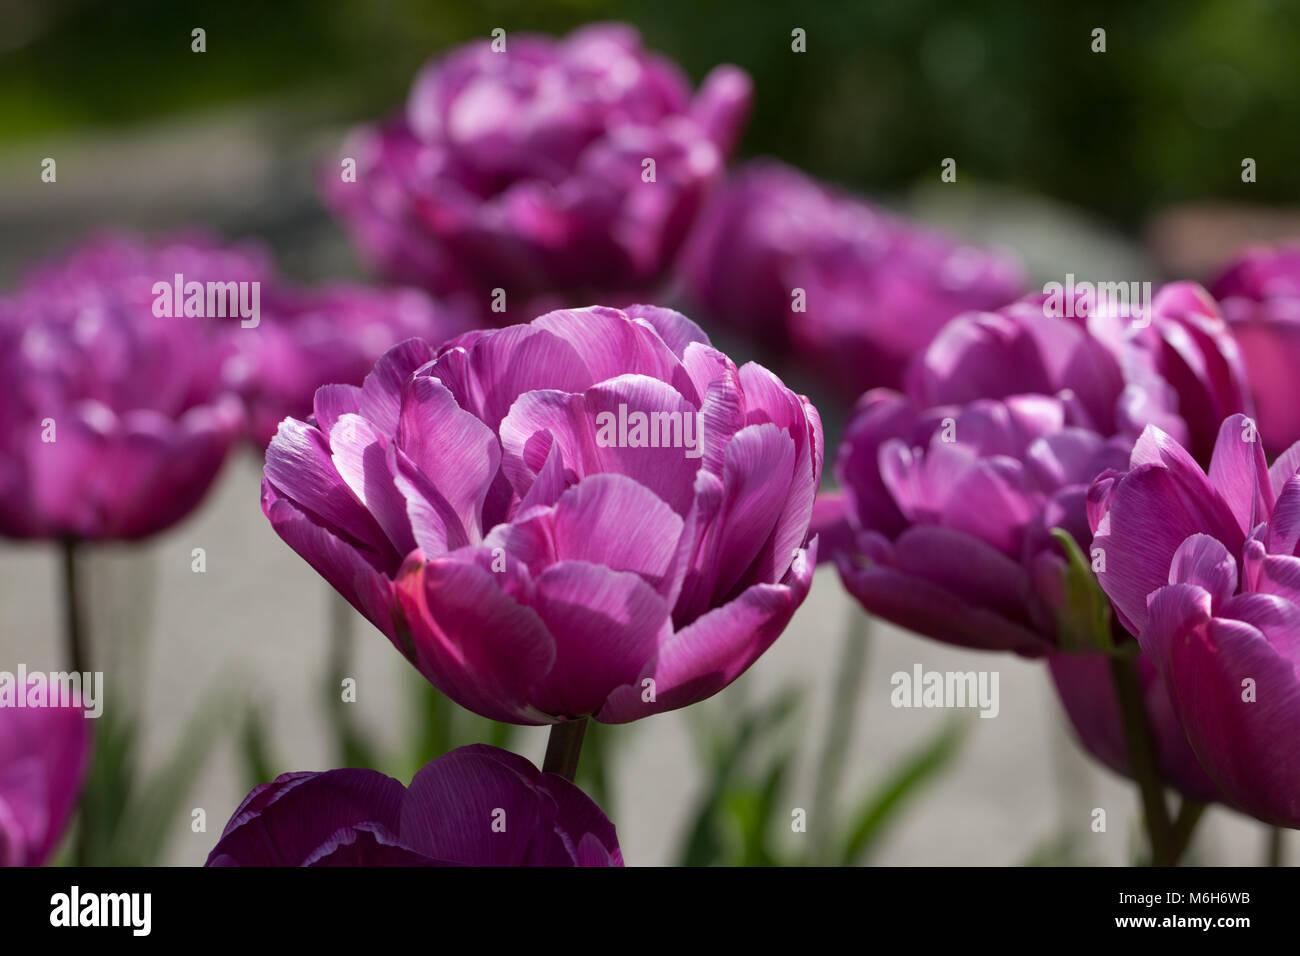 'Perfección' lila doble Tulip tardía, Sen fylldblommig tulpan (Tulipa gesneriana) Imagen De Stock